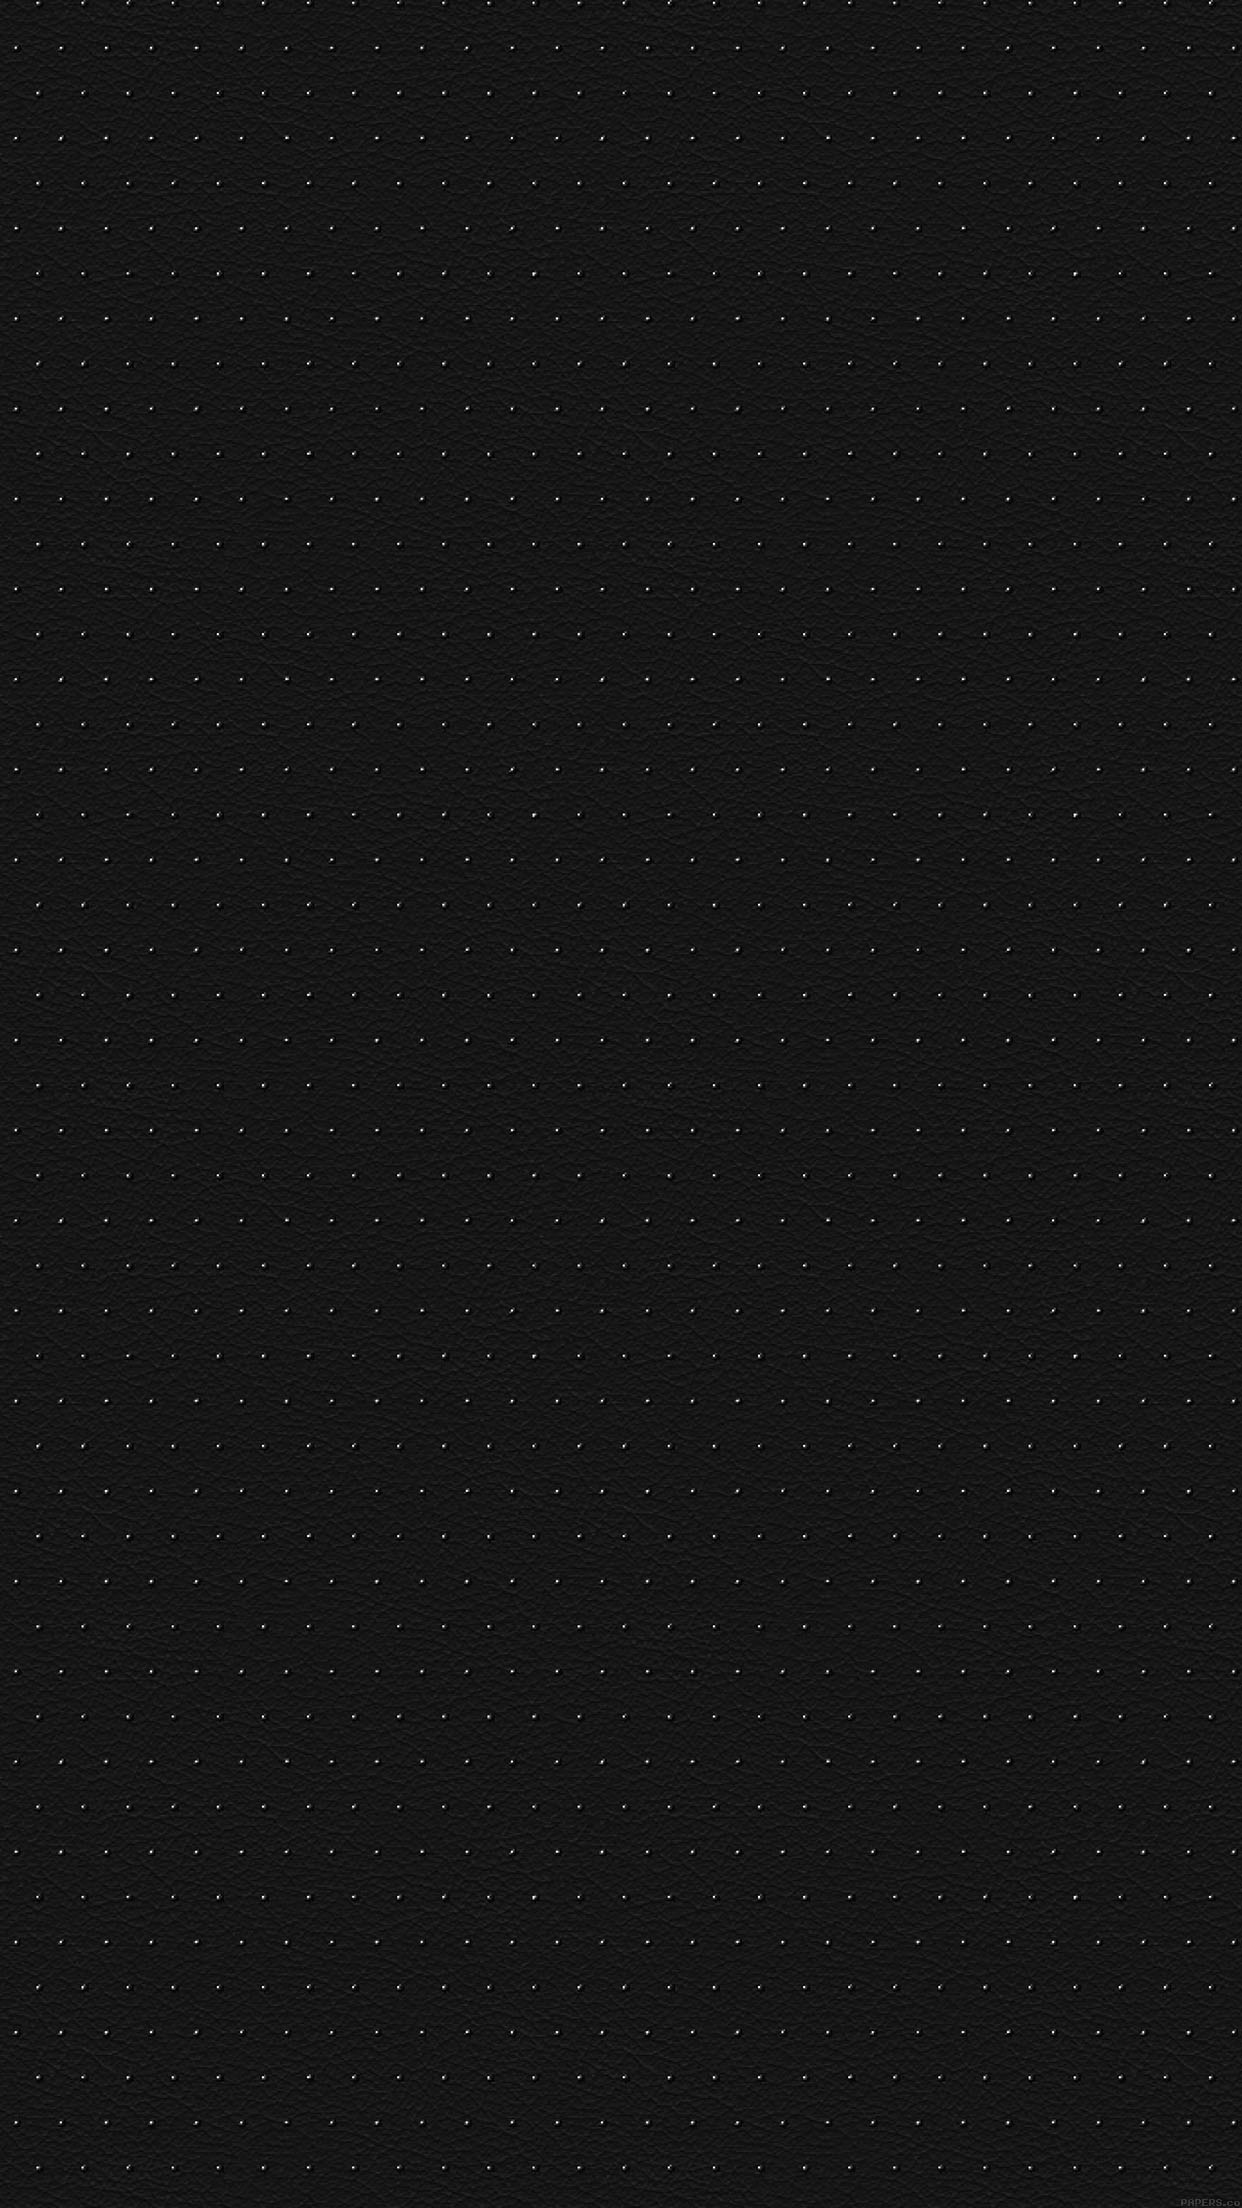 wallpaper iphone 7 black